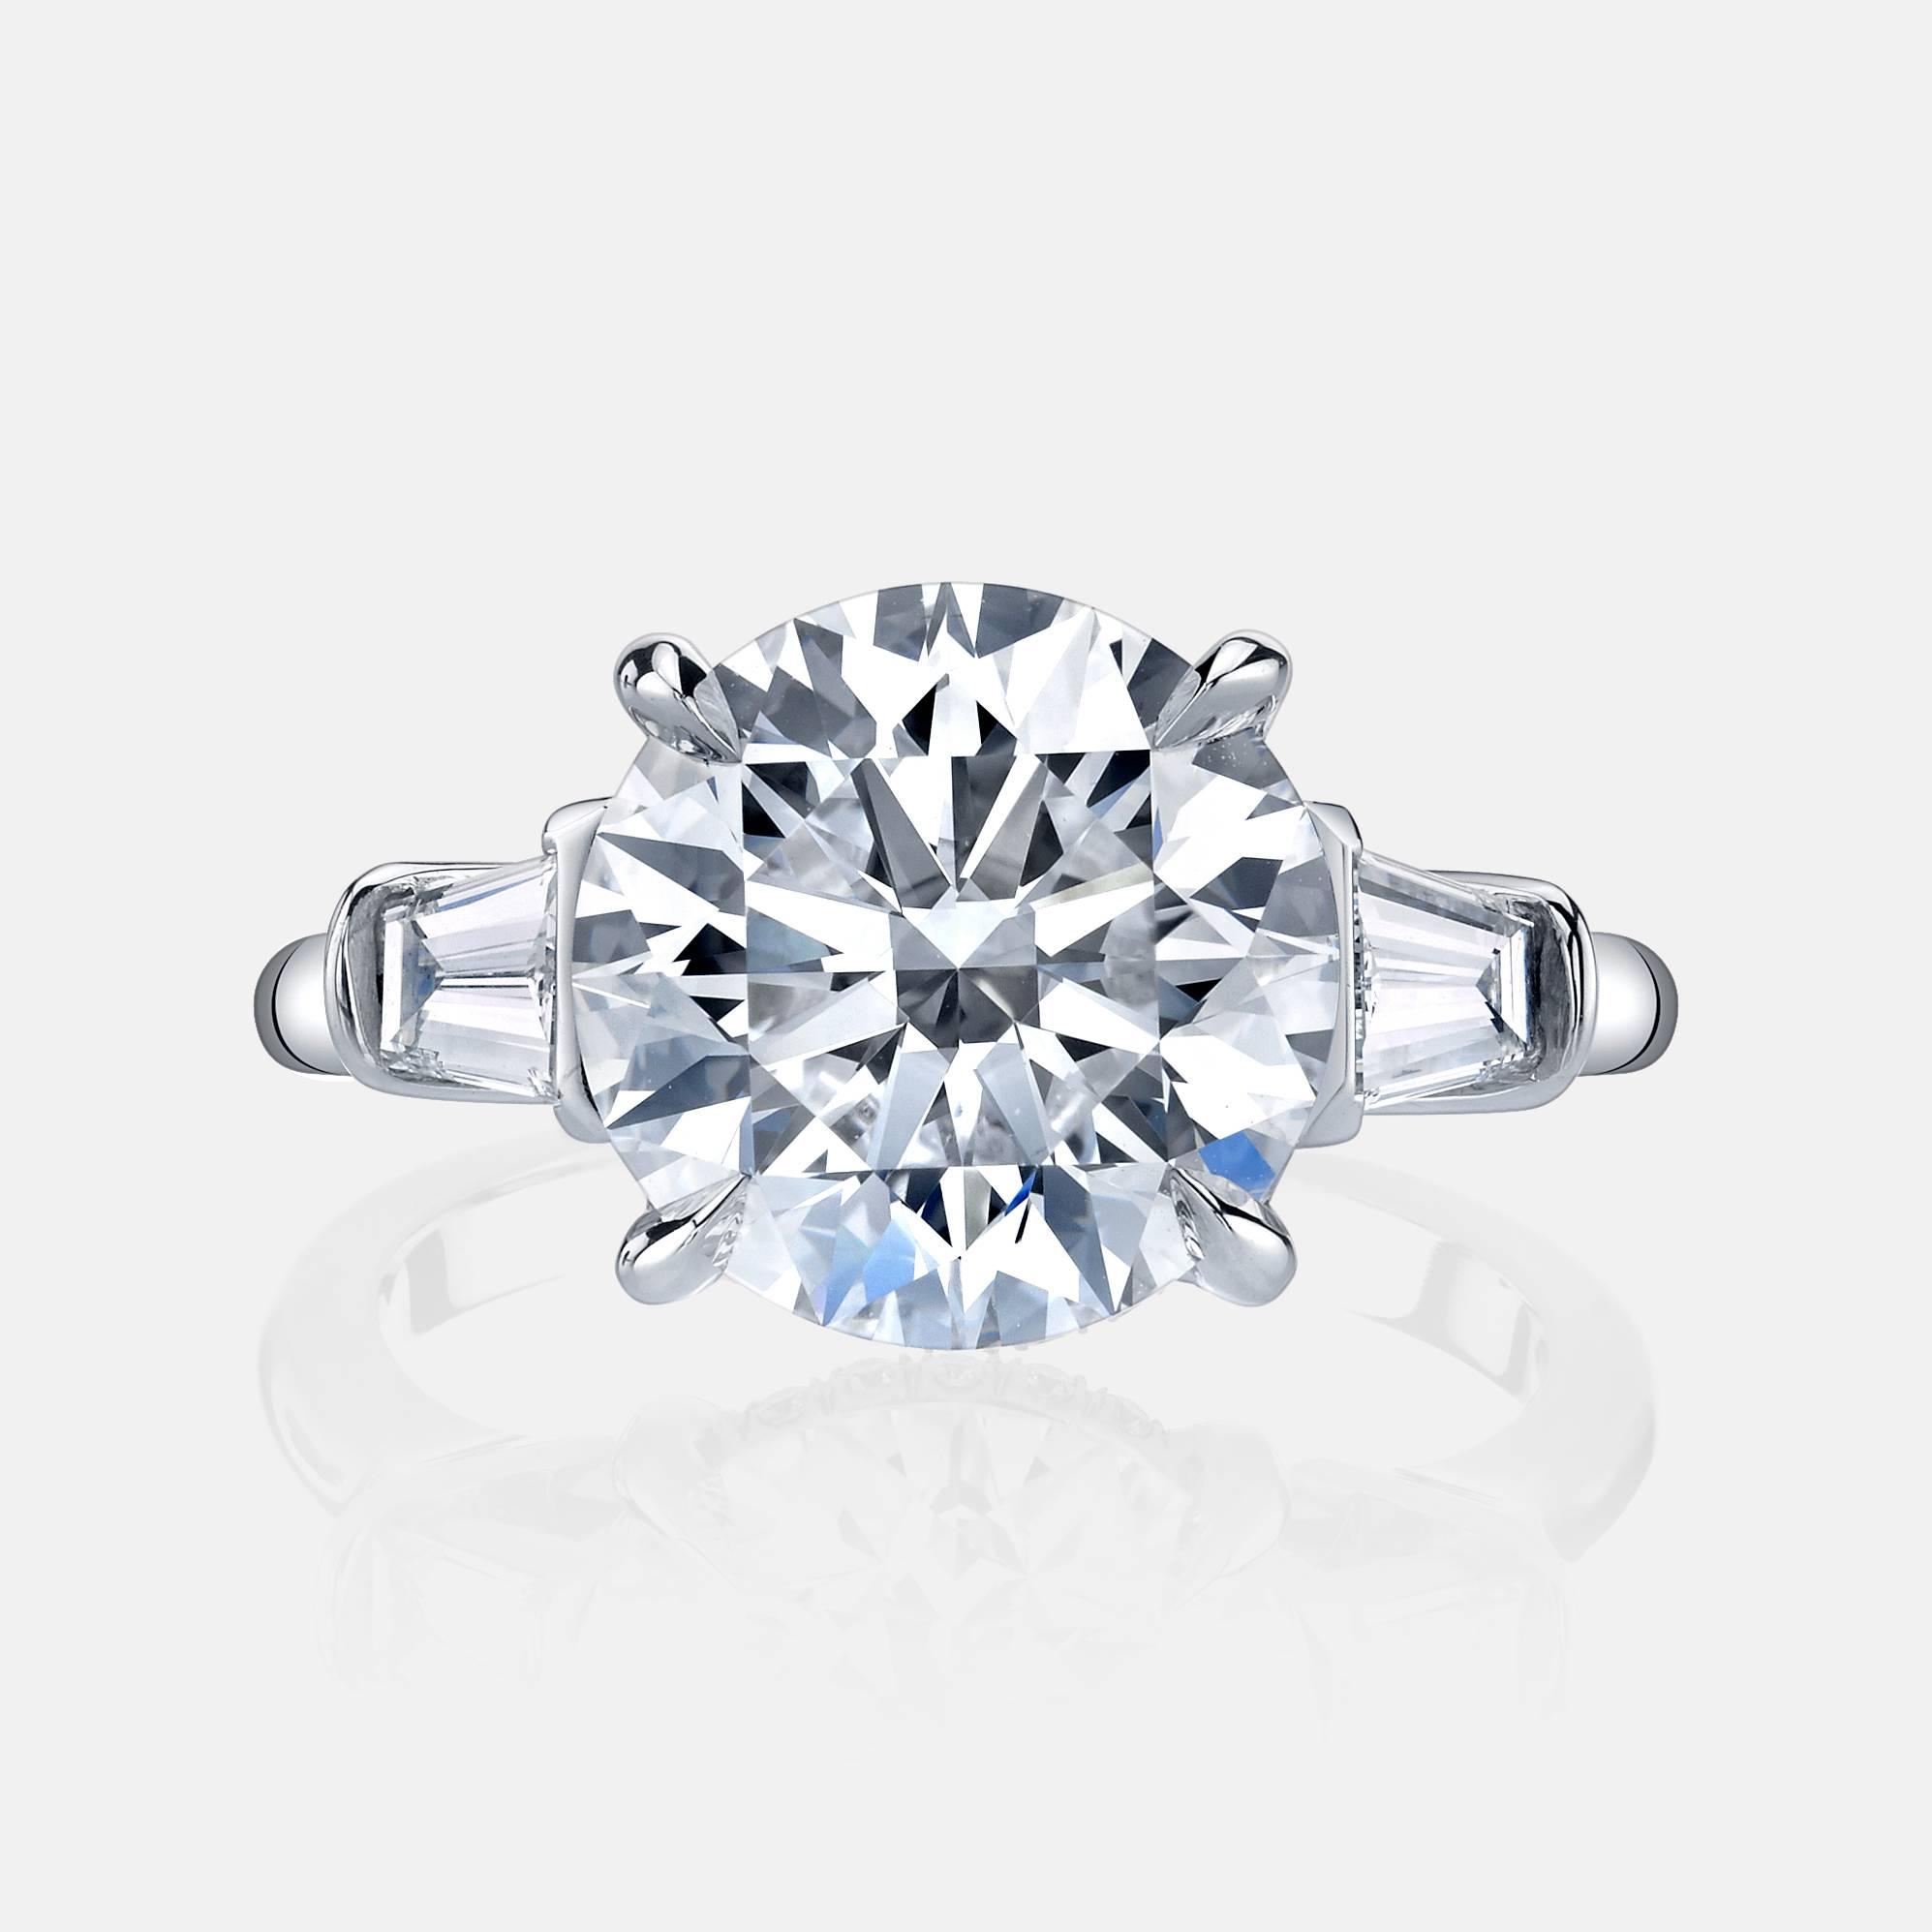 Custom Rings – Handcrafted Diamond Engagement Rings With Handcrafted Engagement Rings (View 15 of 15)